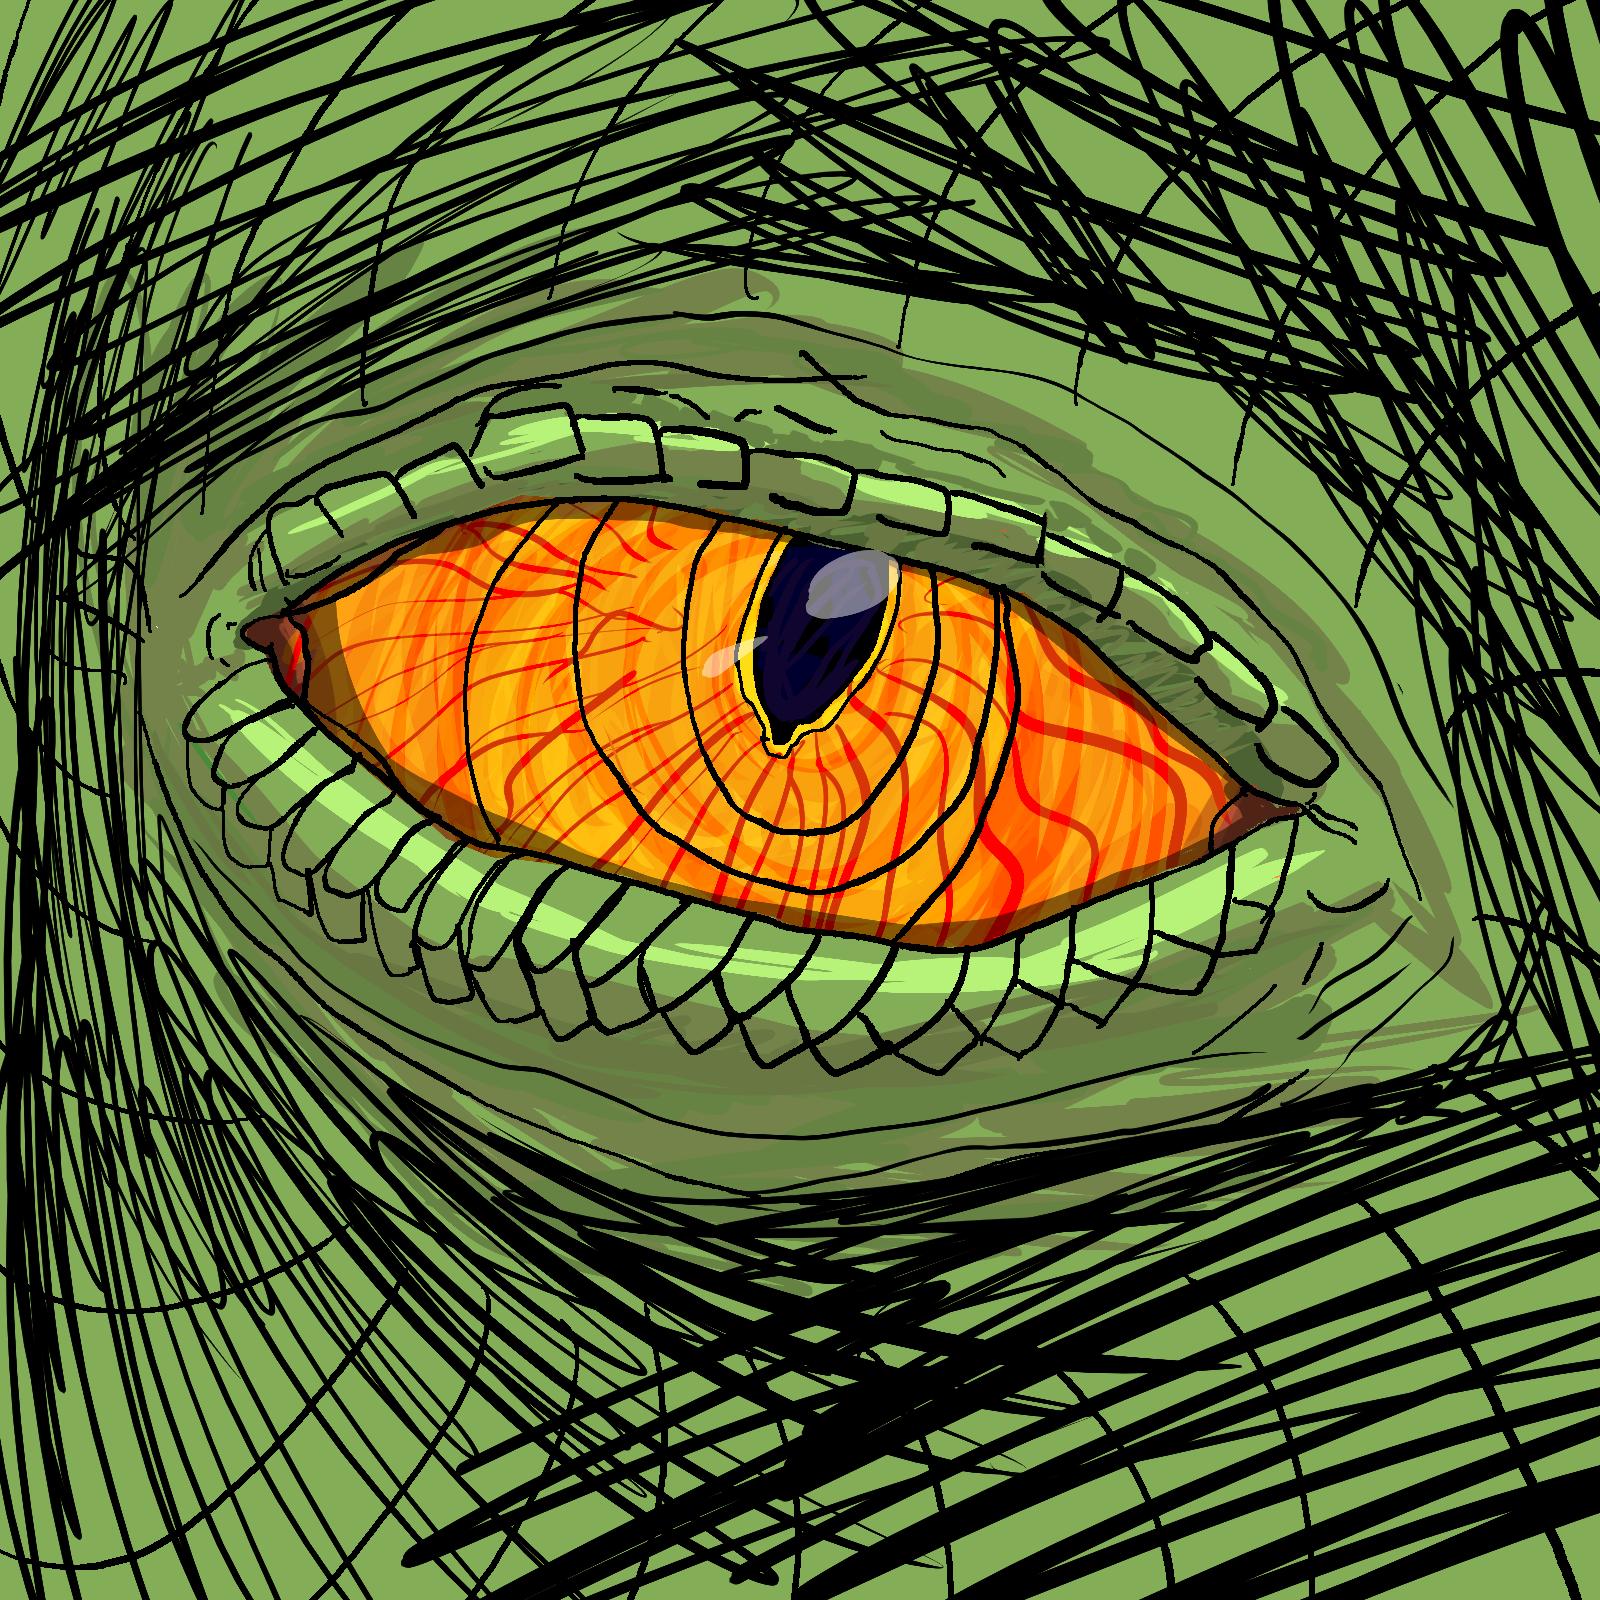 Eyeball (how many drawing of eyes did i post on newgrounds)